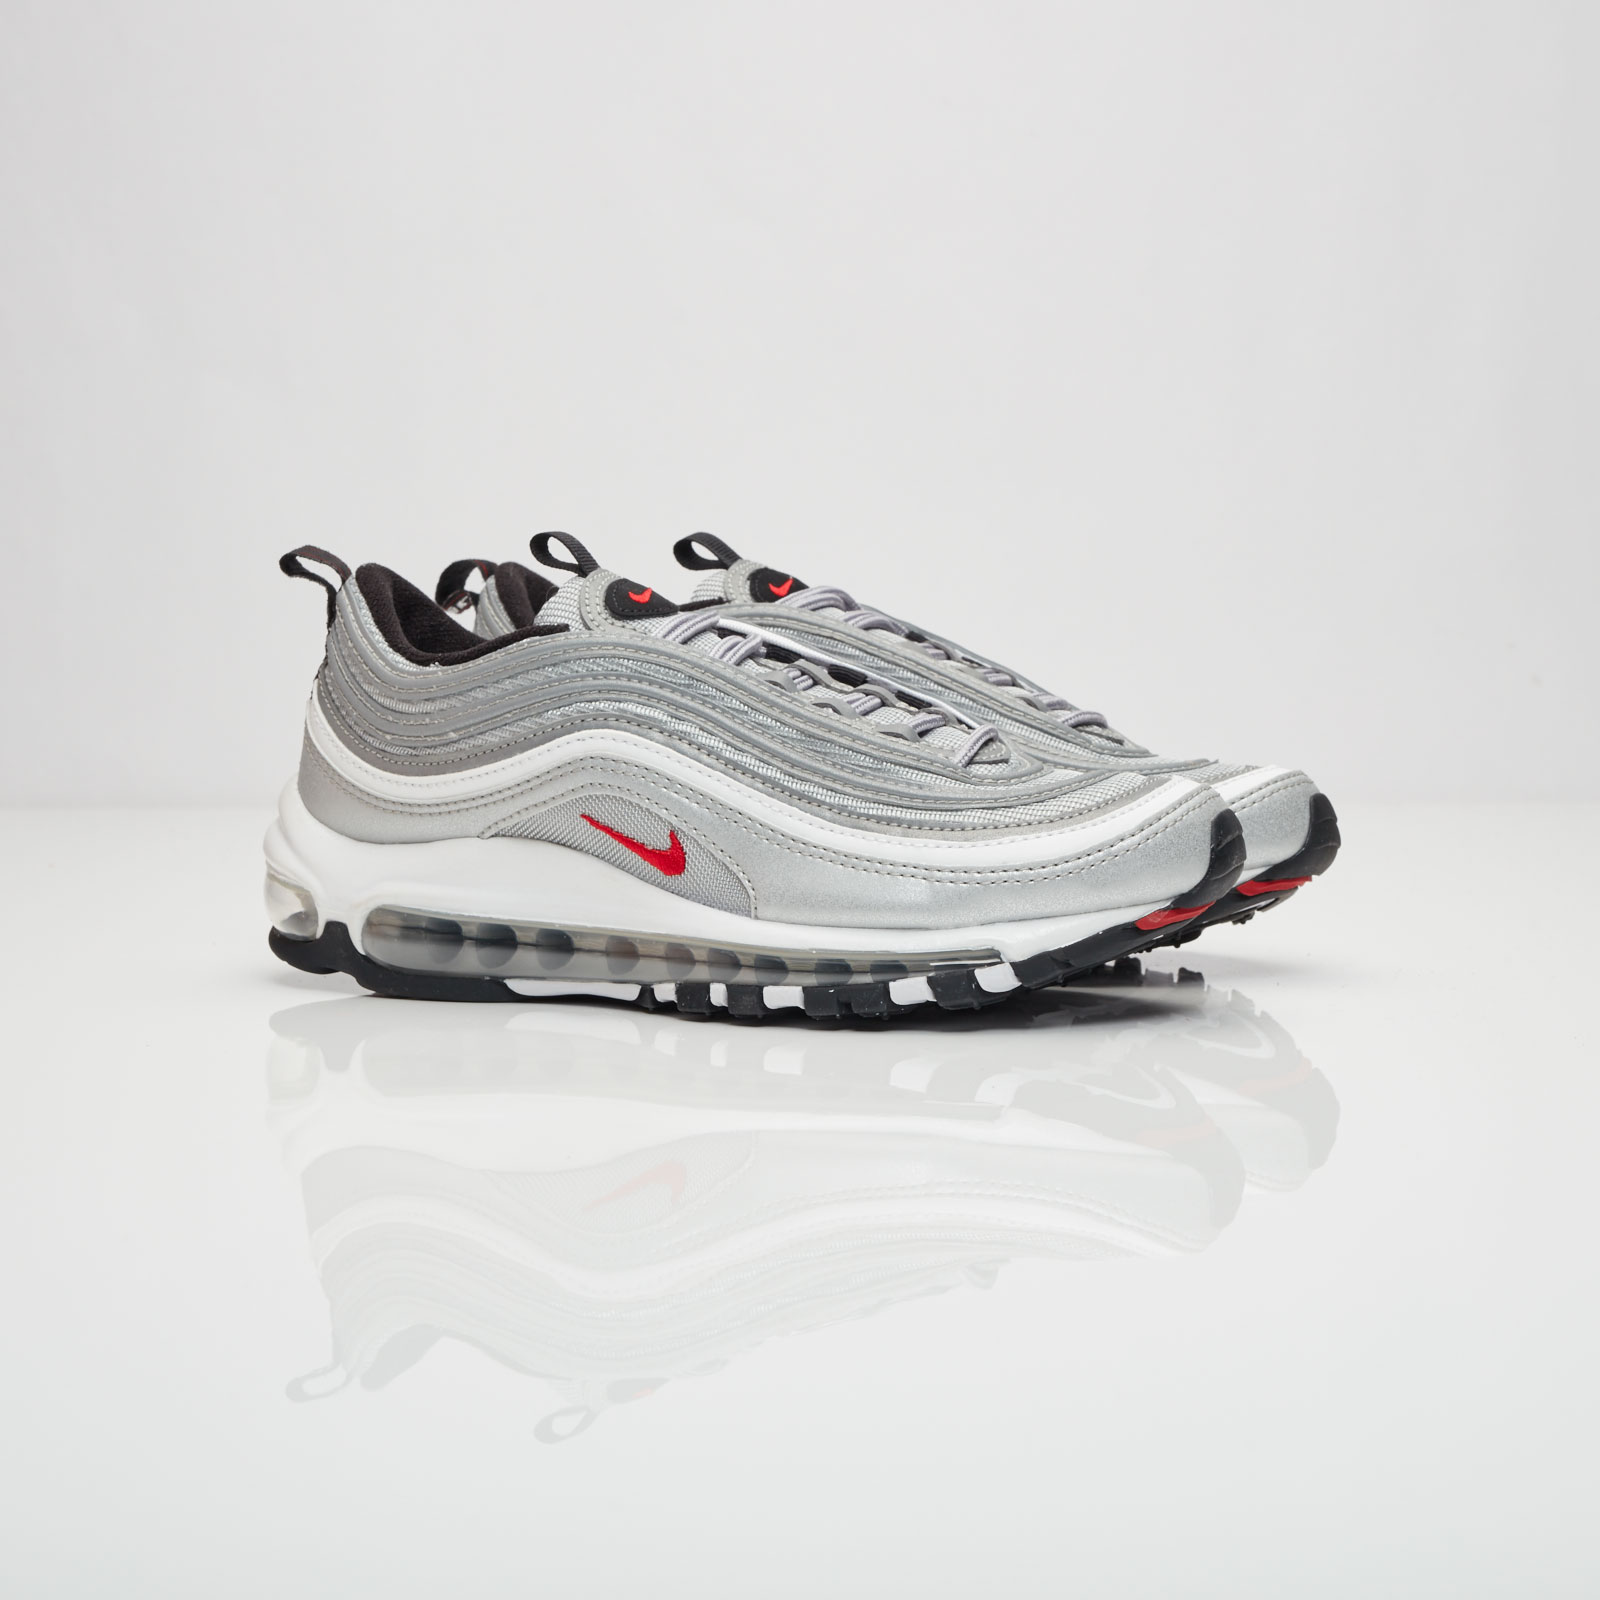 Nike Wmns Air Max 97 OG QS 885691 001 Sneakersnstuff I